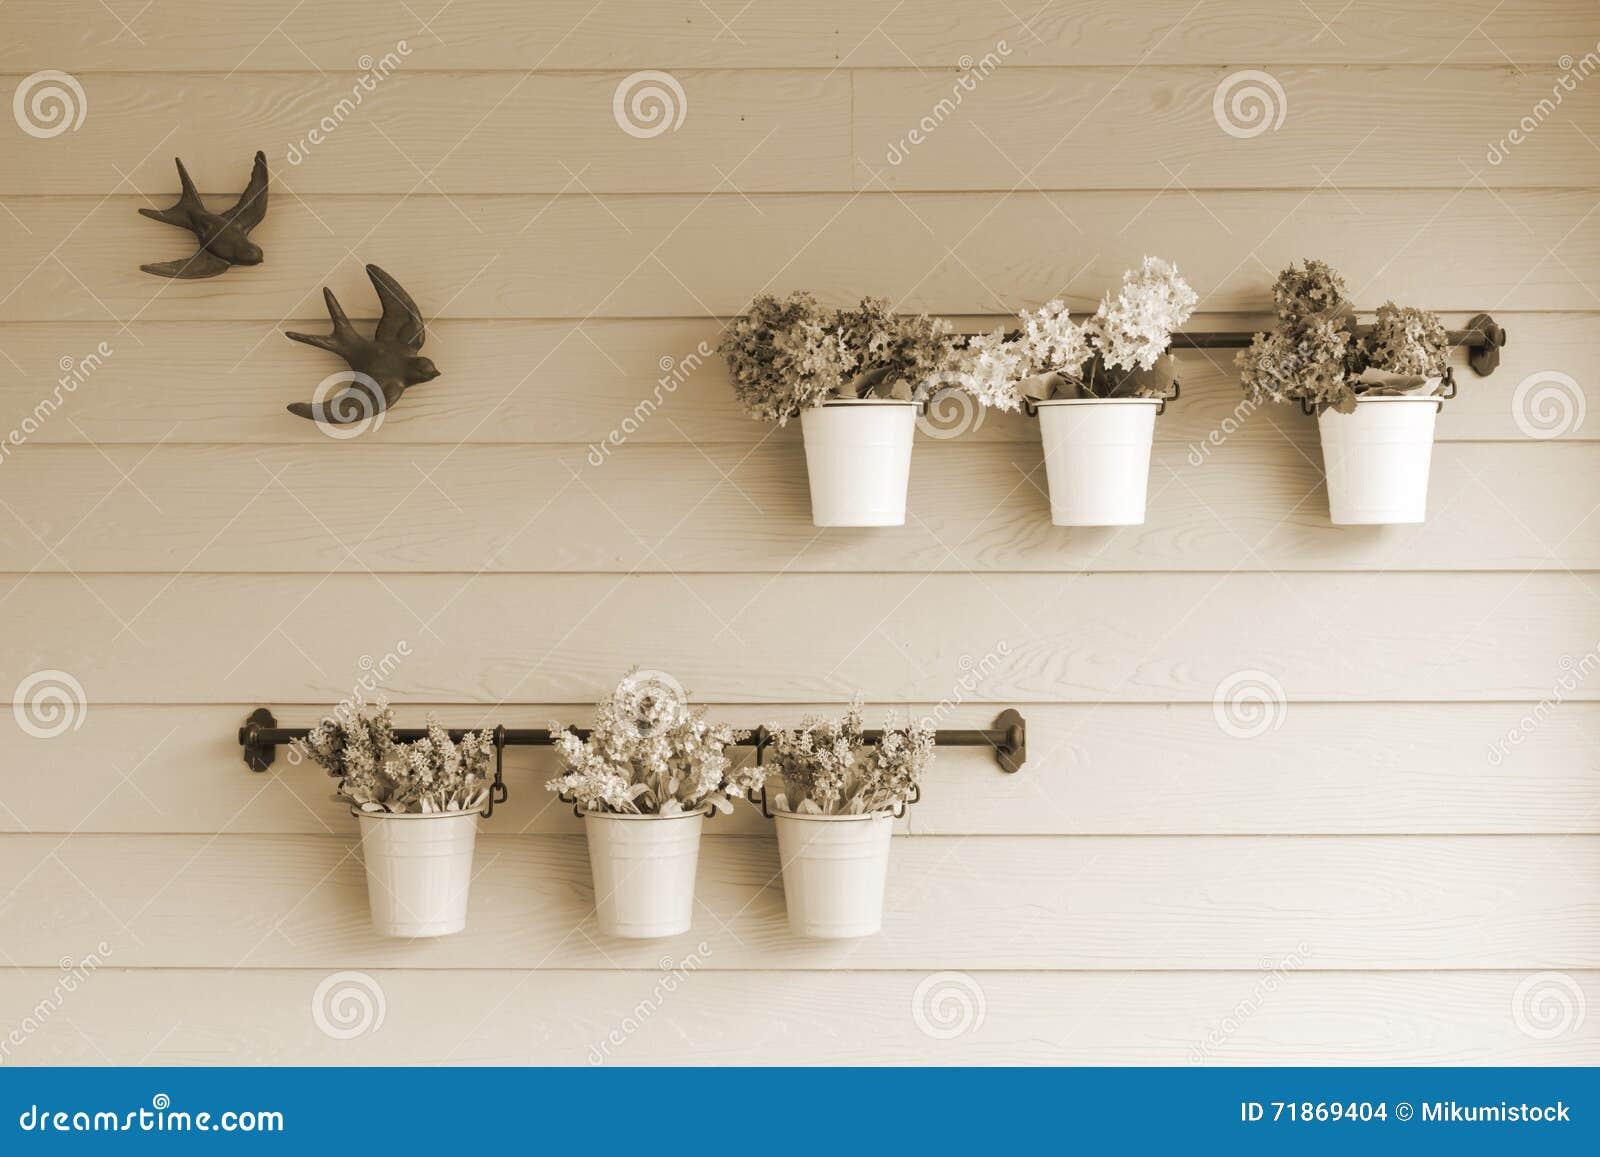 Flor pequena do potenciômetro a bordo da parede de madeira